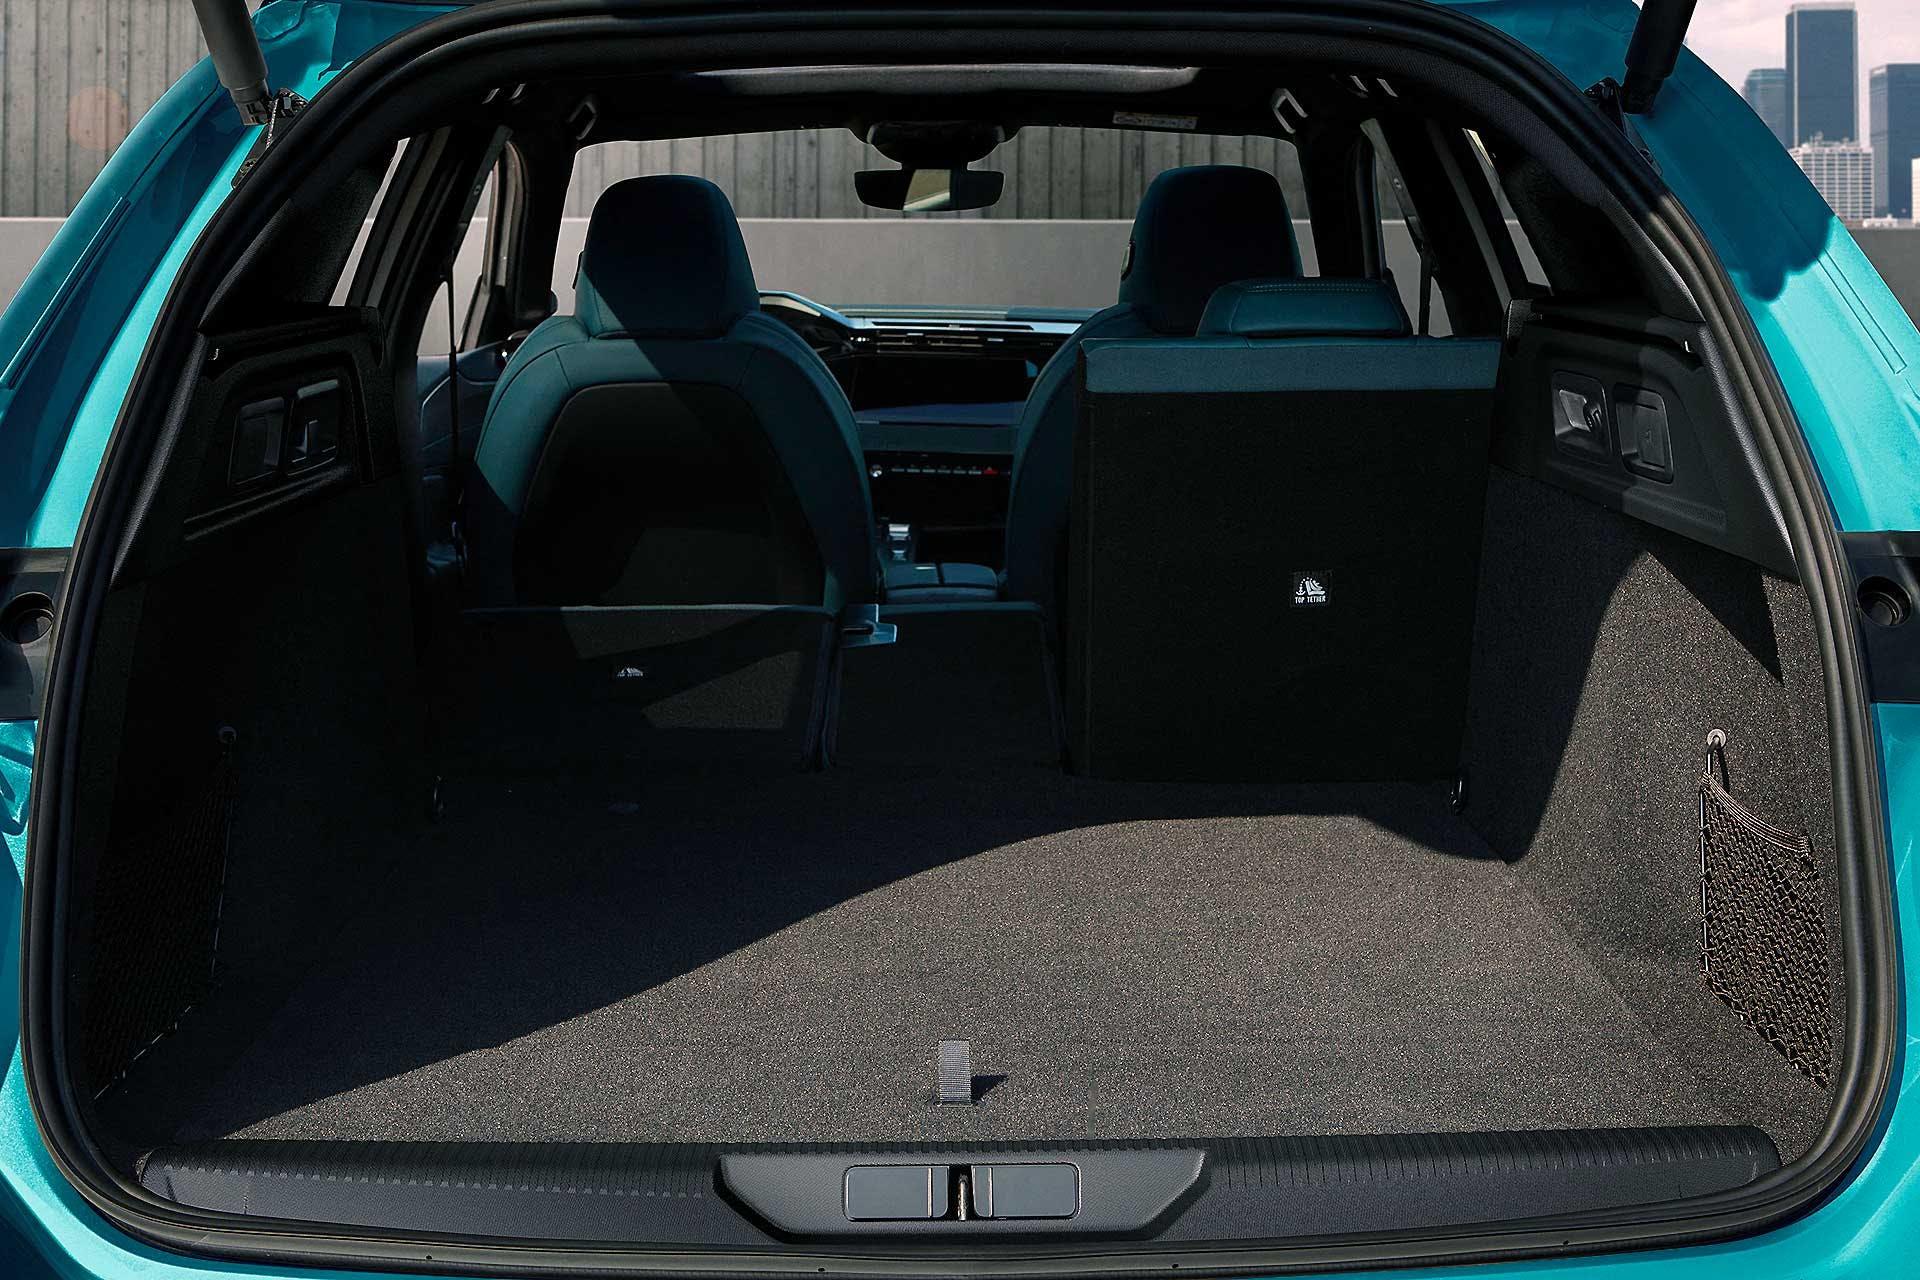 Nuova Peugeot 308 SW 2021 bagagliaio